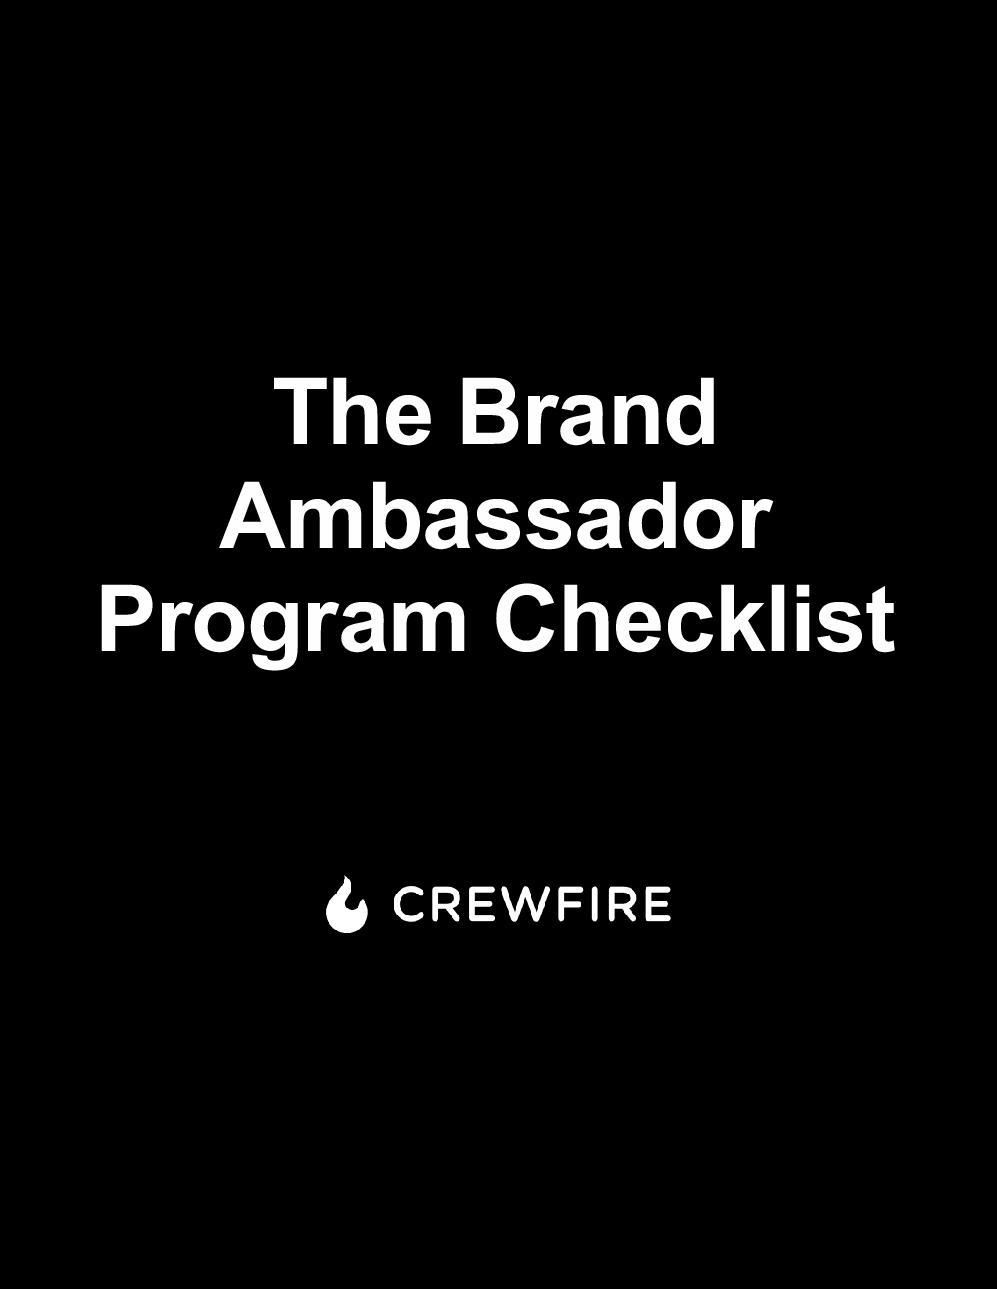 36 Tactics to Recruit Brand Ambassadors - CrewFire Guide